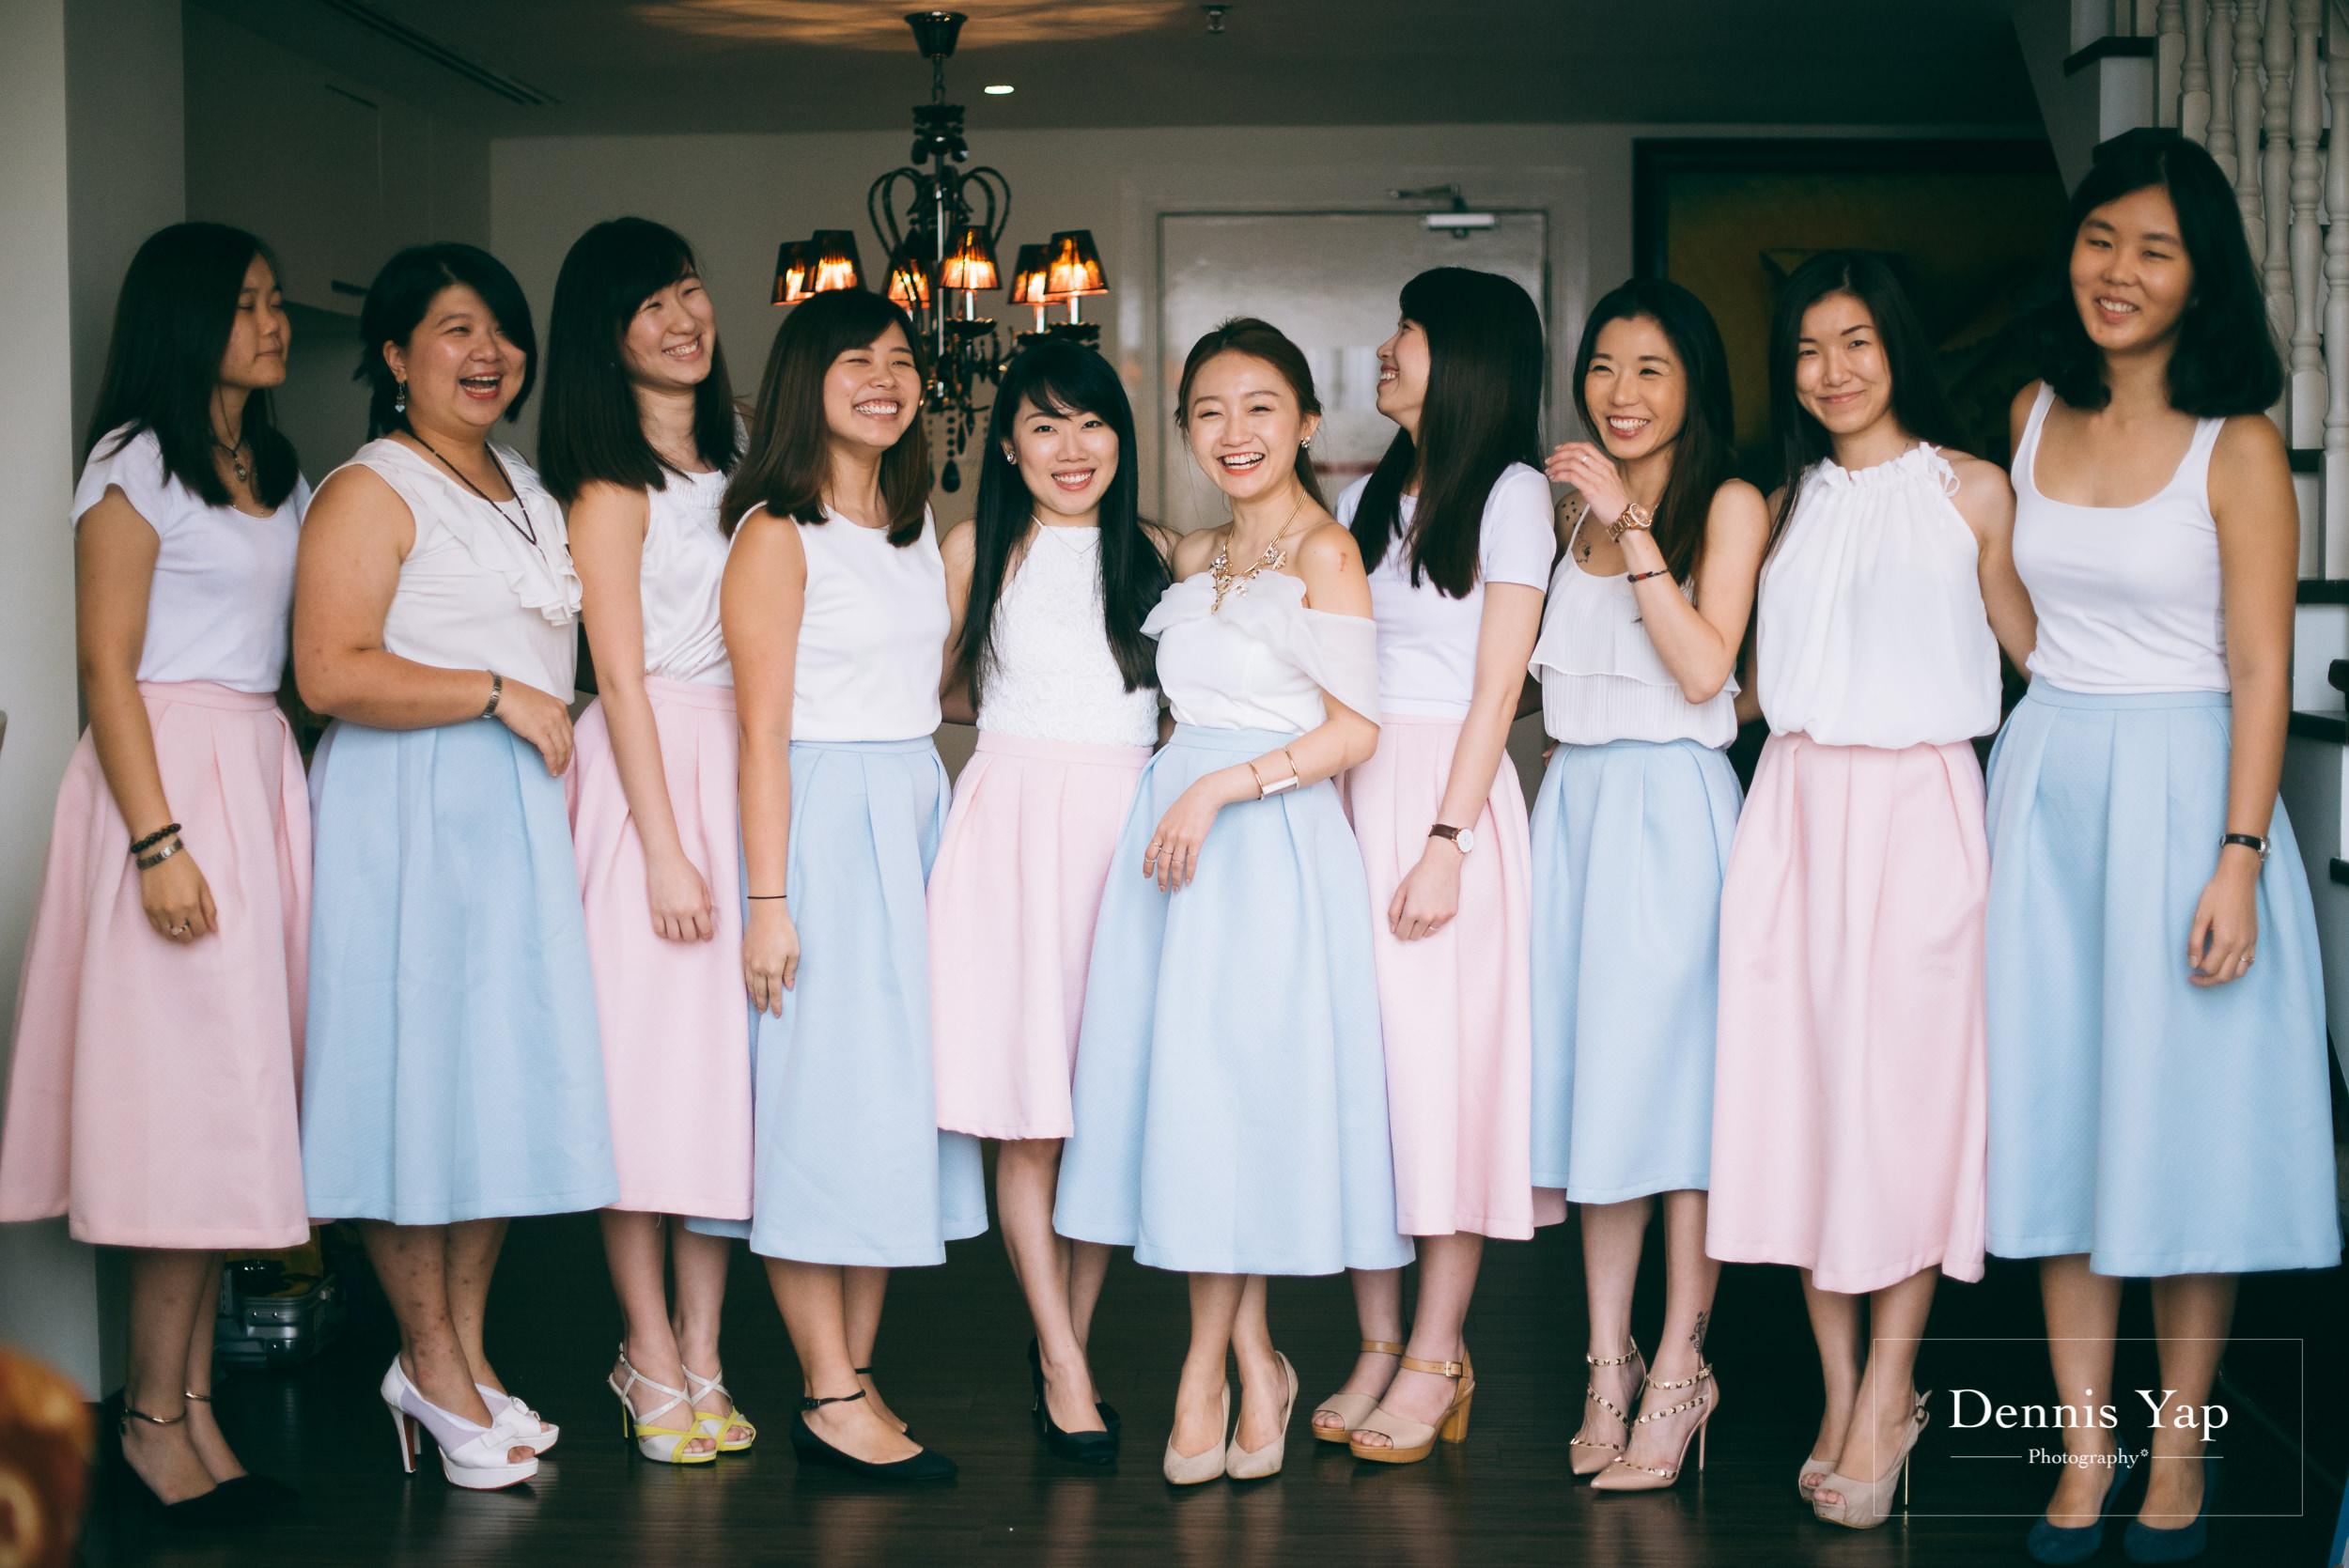 joon keat siew hui wedding day dennis yap malaysia wedding photographer-3.jpg